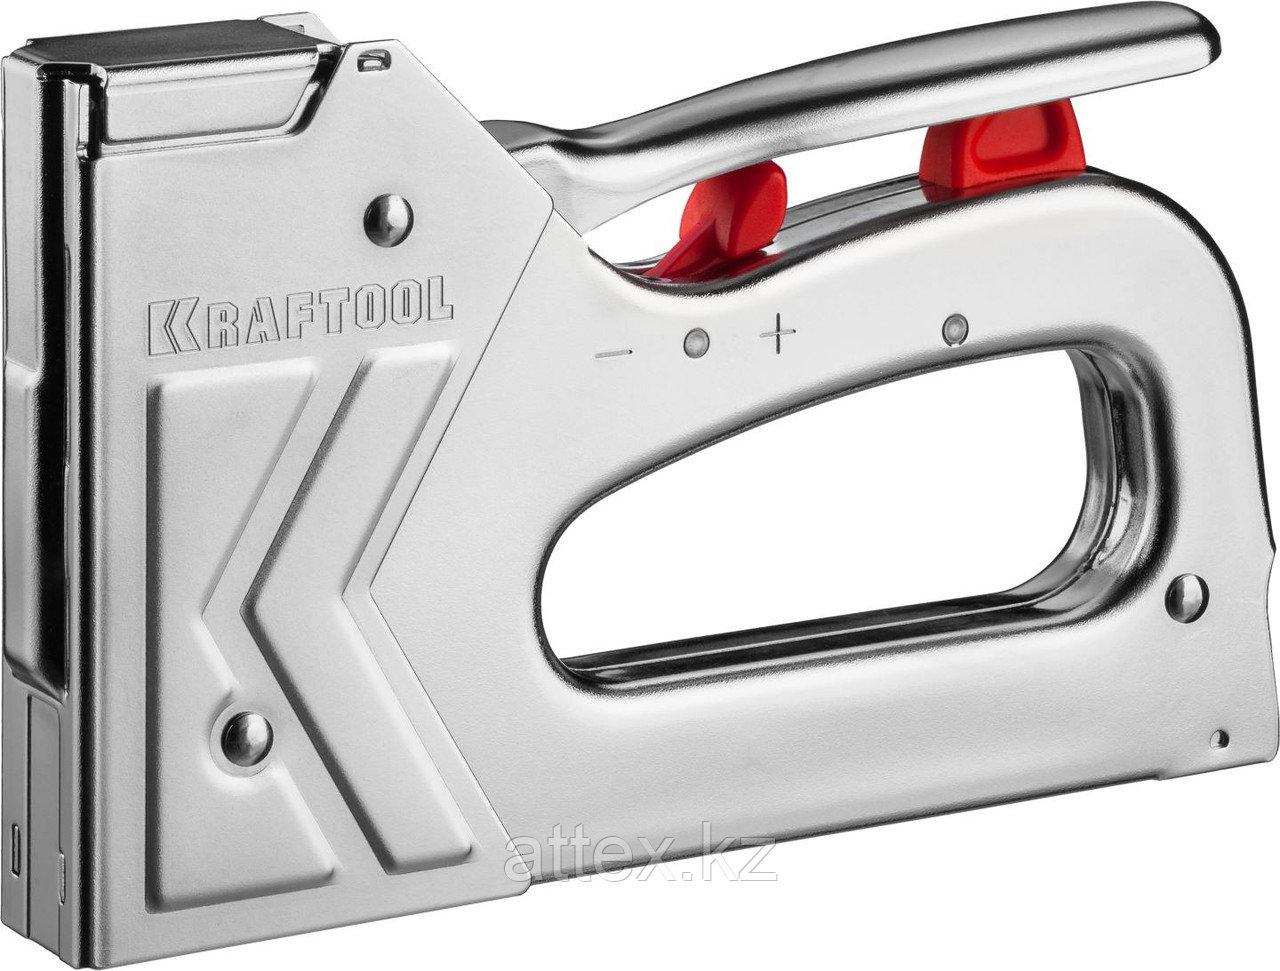 "Степлер для скоб ""K7-A"" 3-в-1: тип 53 (6-16 мм) / 300 (16 мм) / 500 (16 мм), KRAFTOOL, 3180"